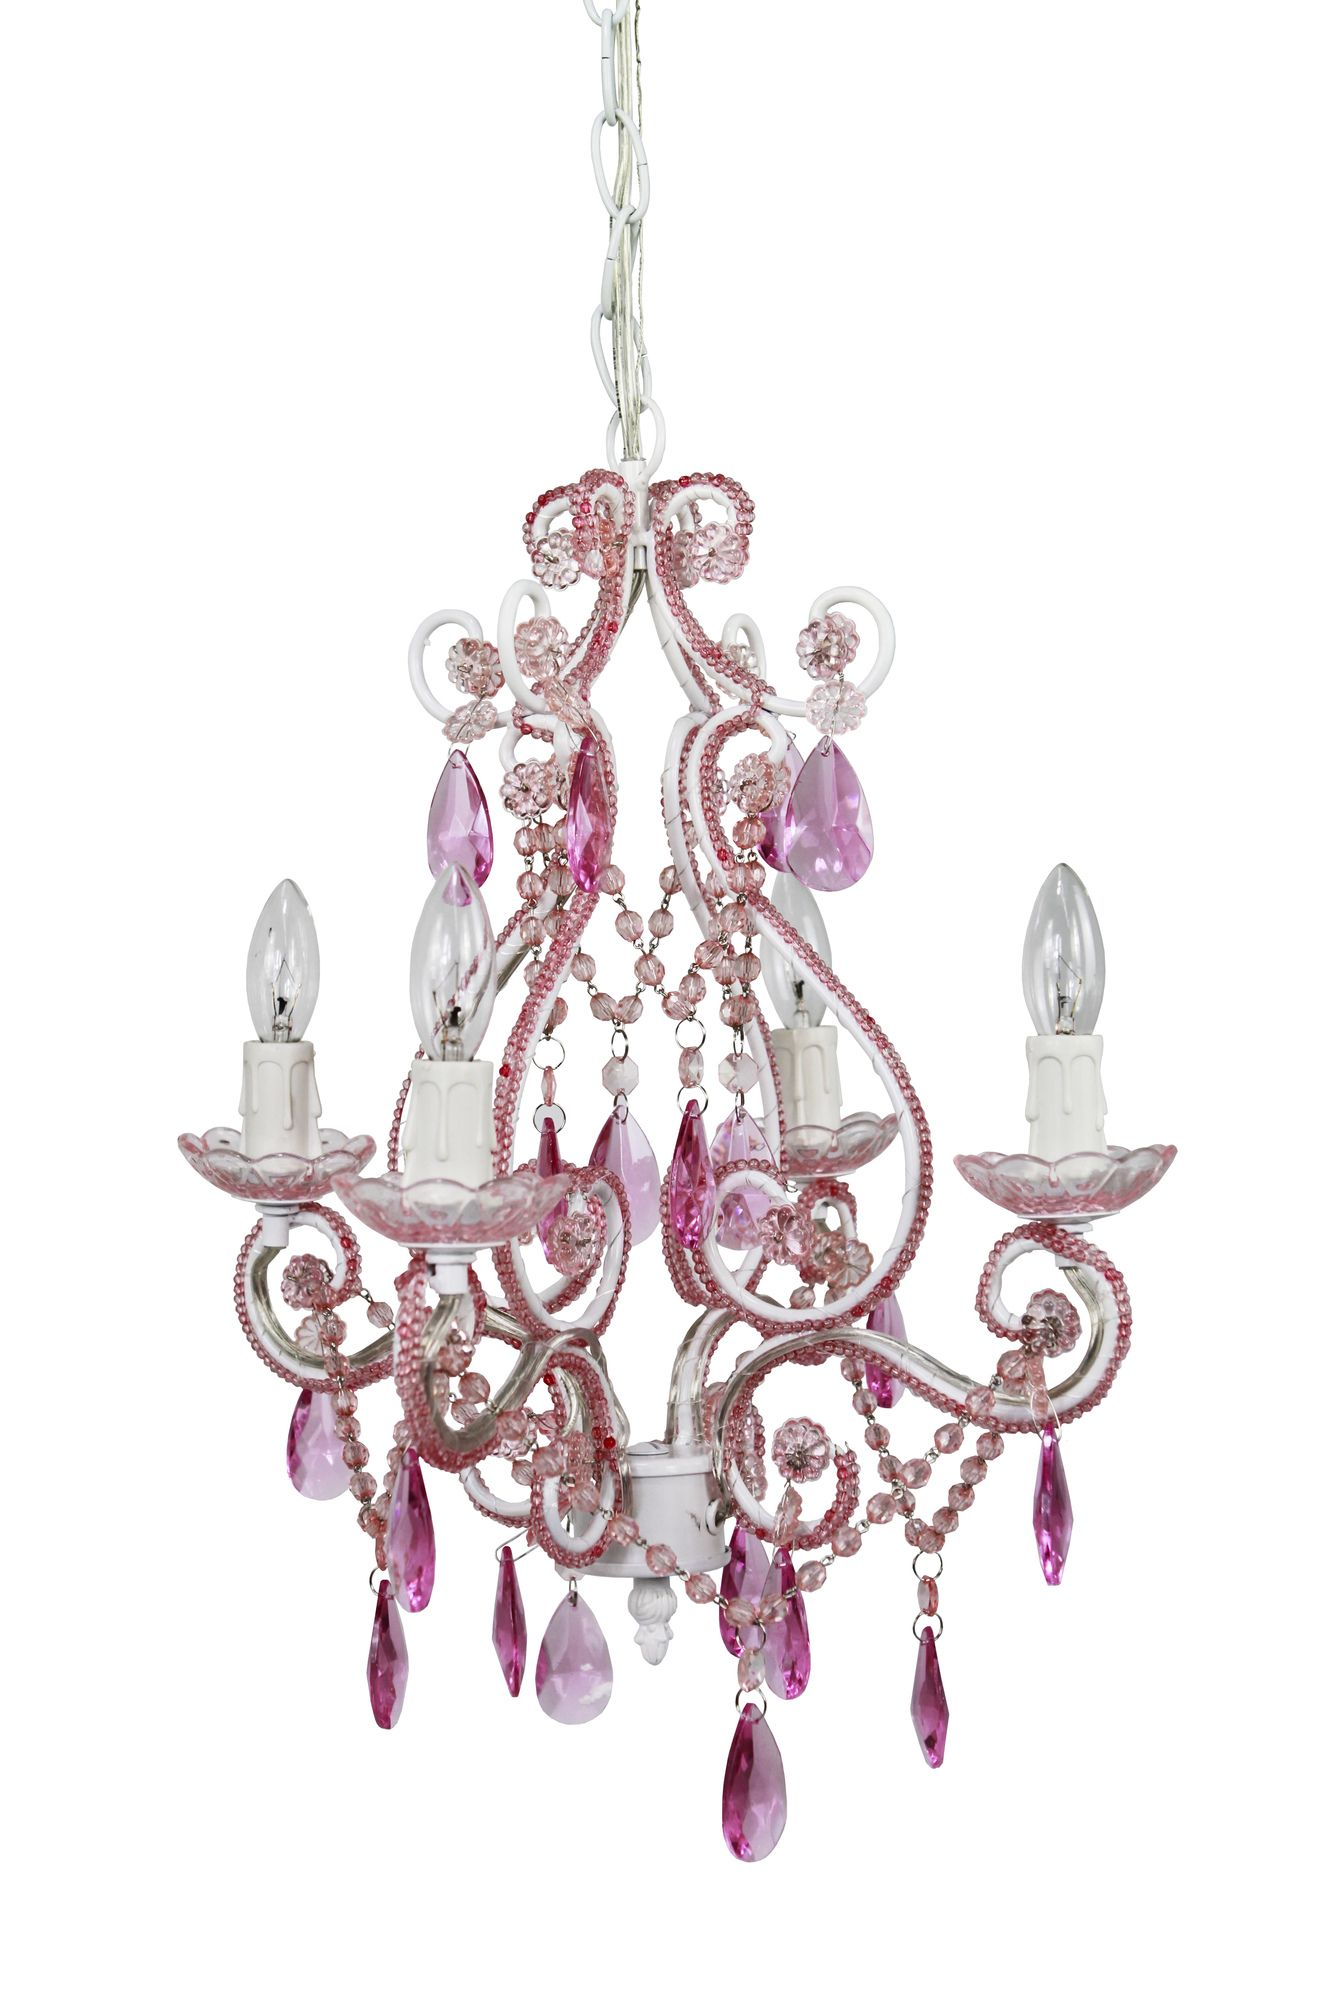 Pin by karien southworth on chandeliers pinterest chandelier